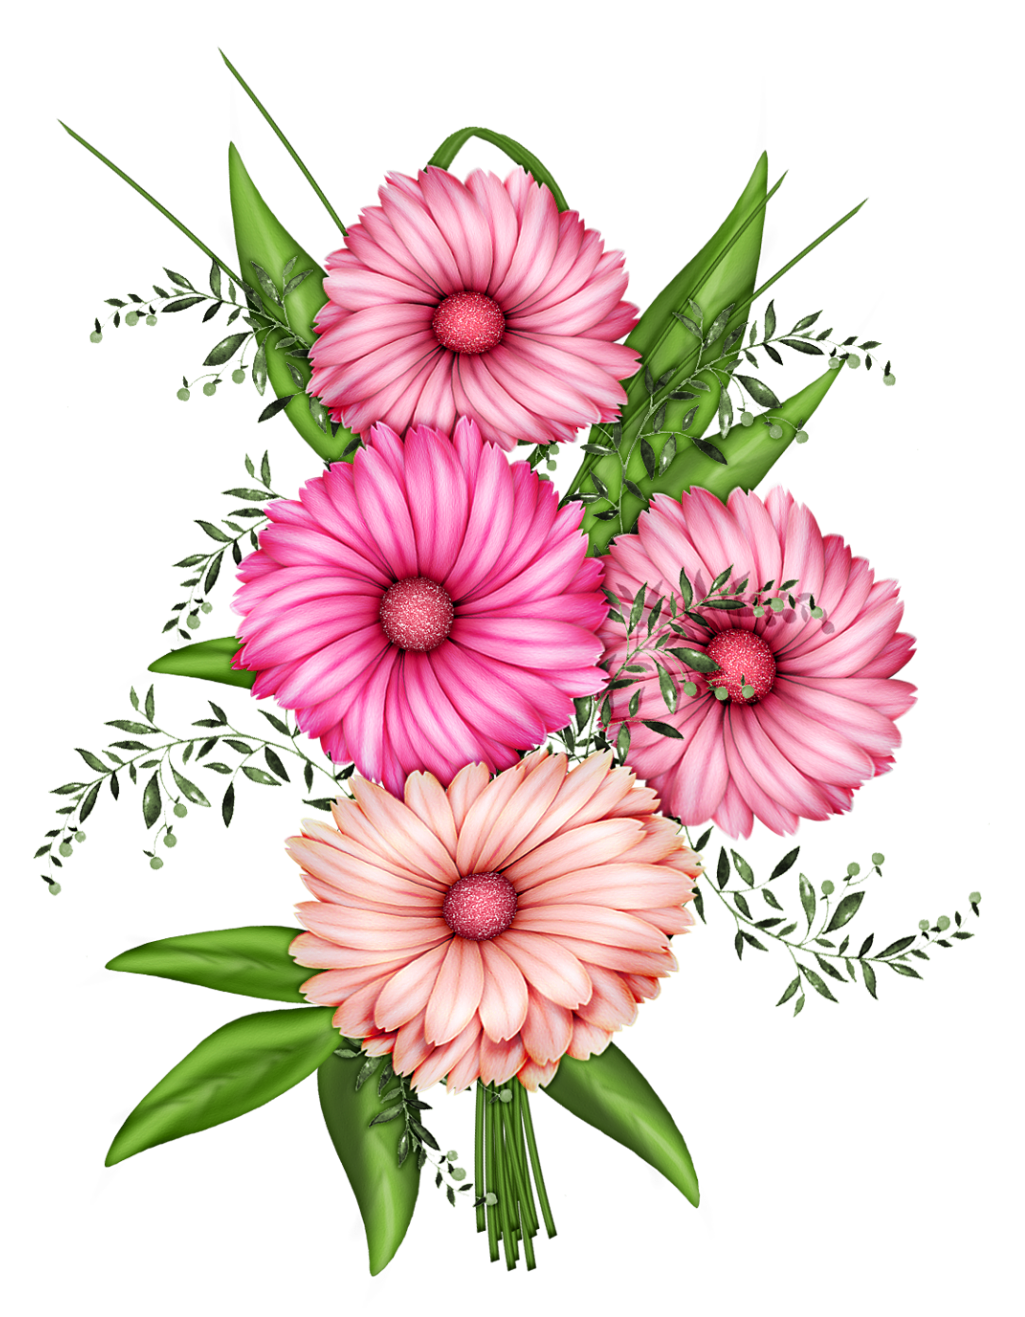 medium resolution of flower images flower photos flowers nature purple flowers beautiful flowers paper